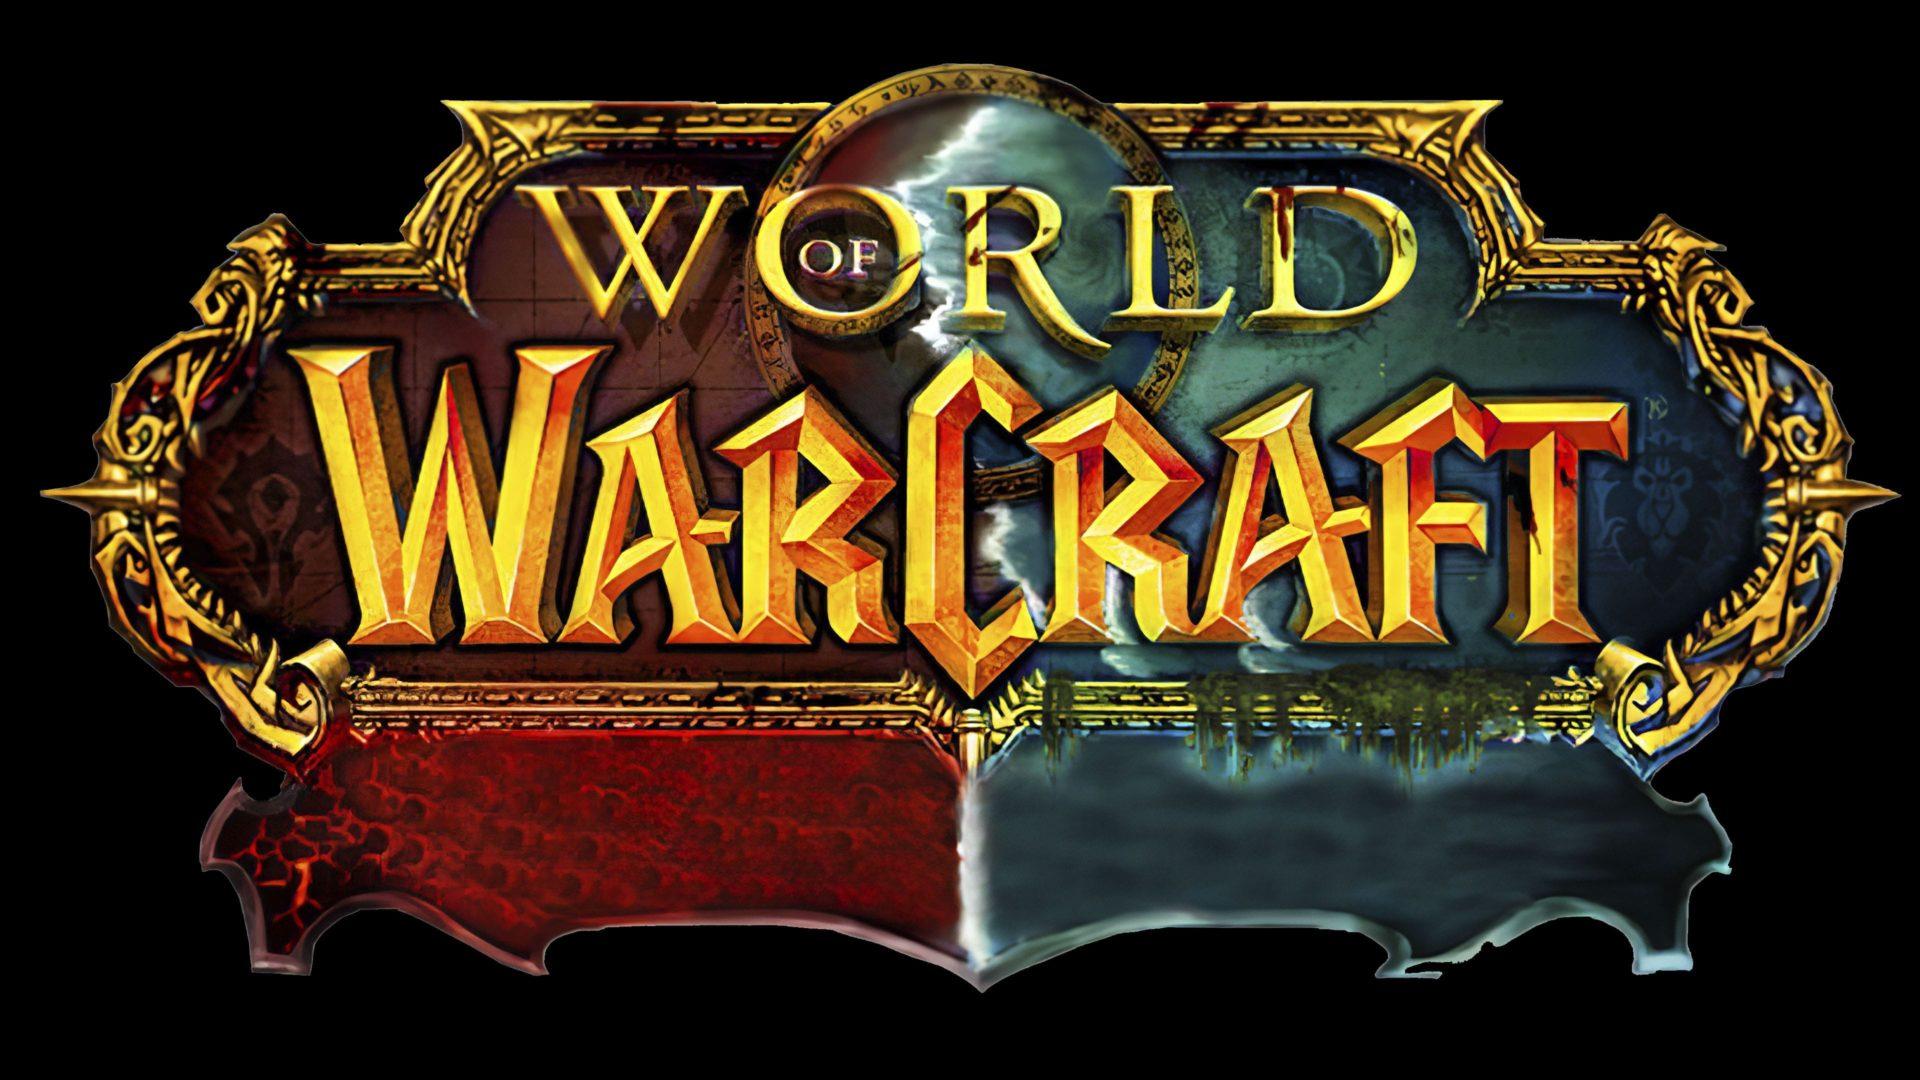 WORLD OF WARCRAFT BLIZZARD ENTERTAINMENT